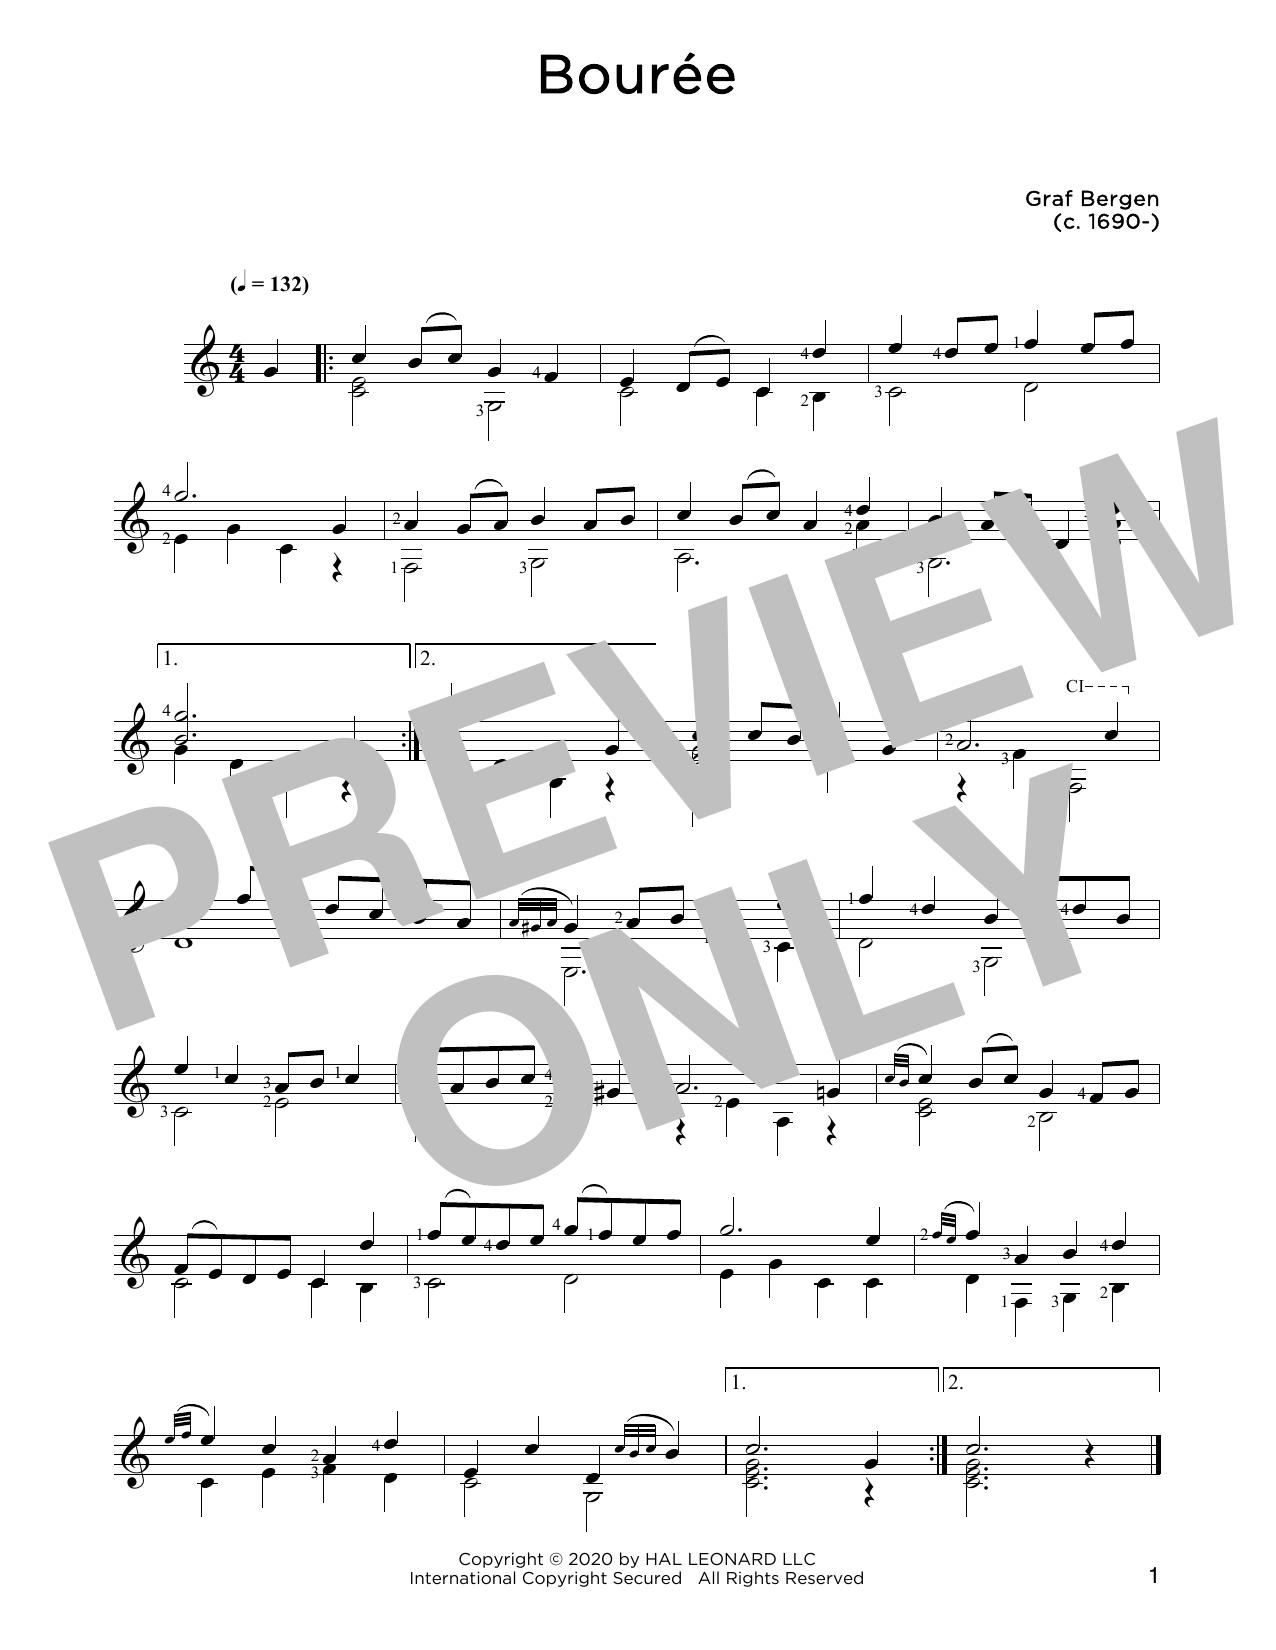 Graf Bergen Bouree sheet music notes and chords. Download Printable PDF.